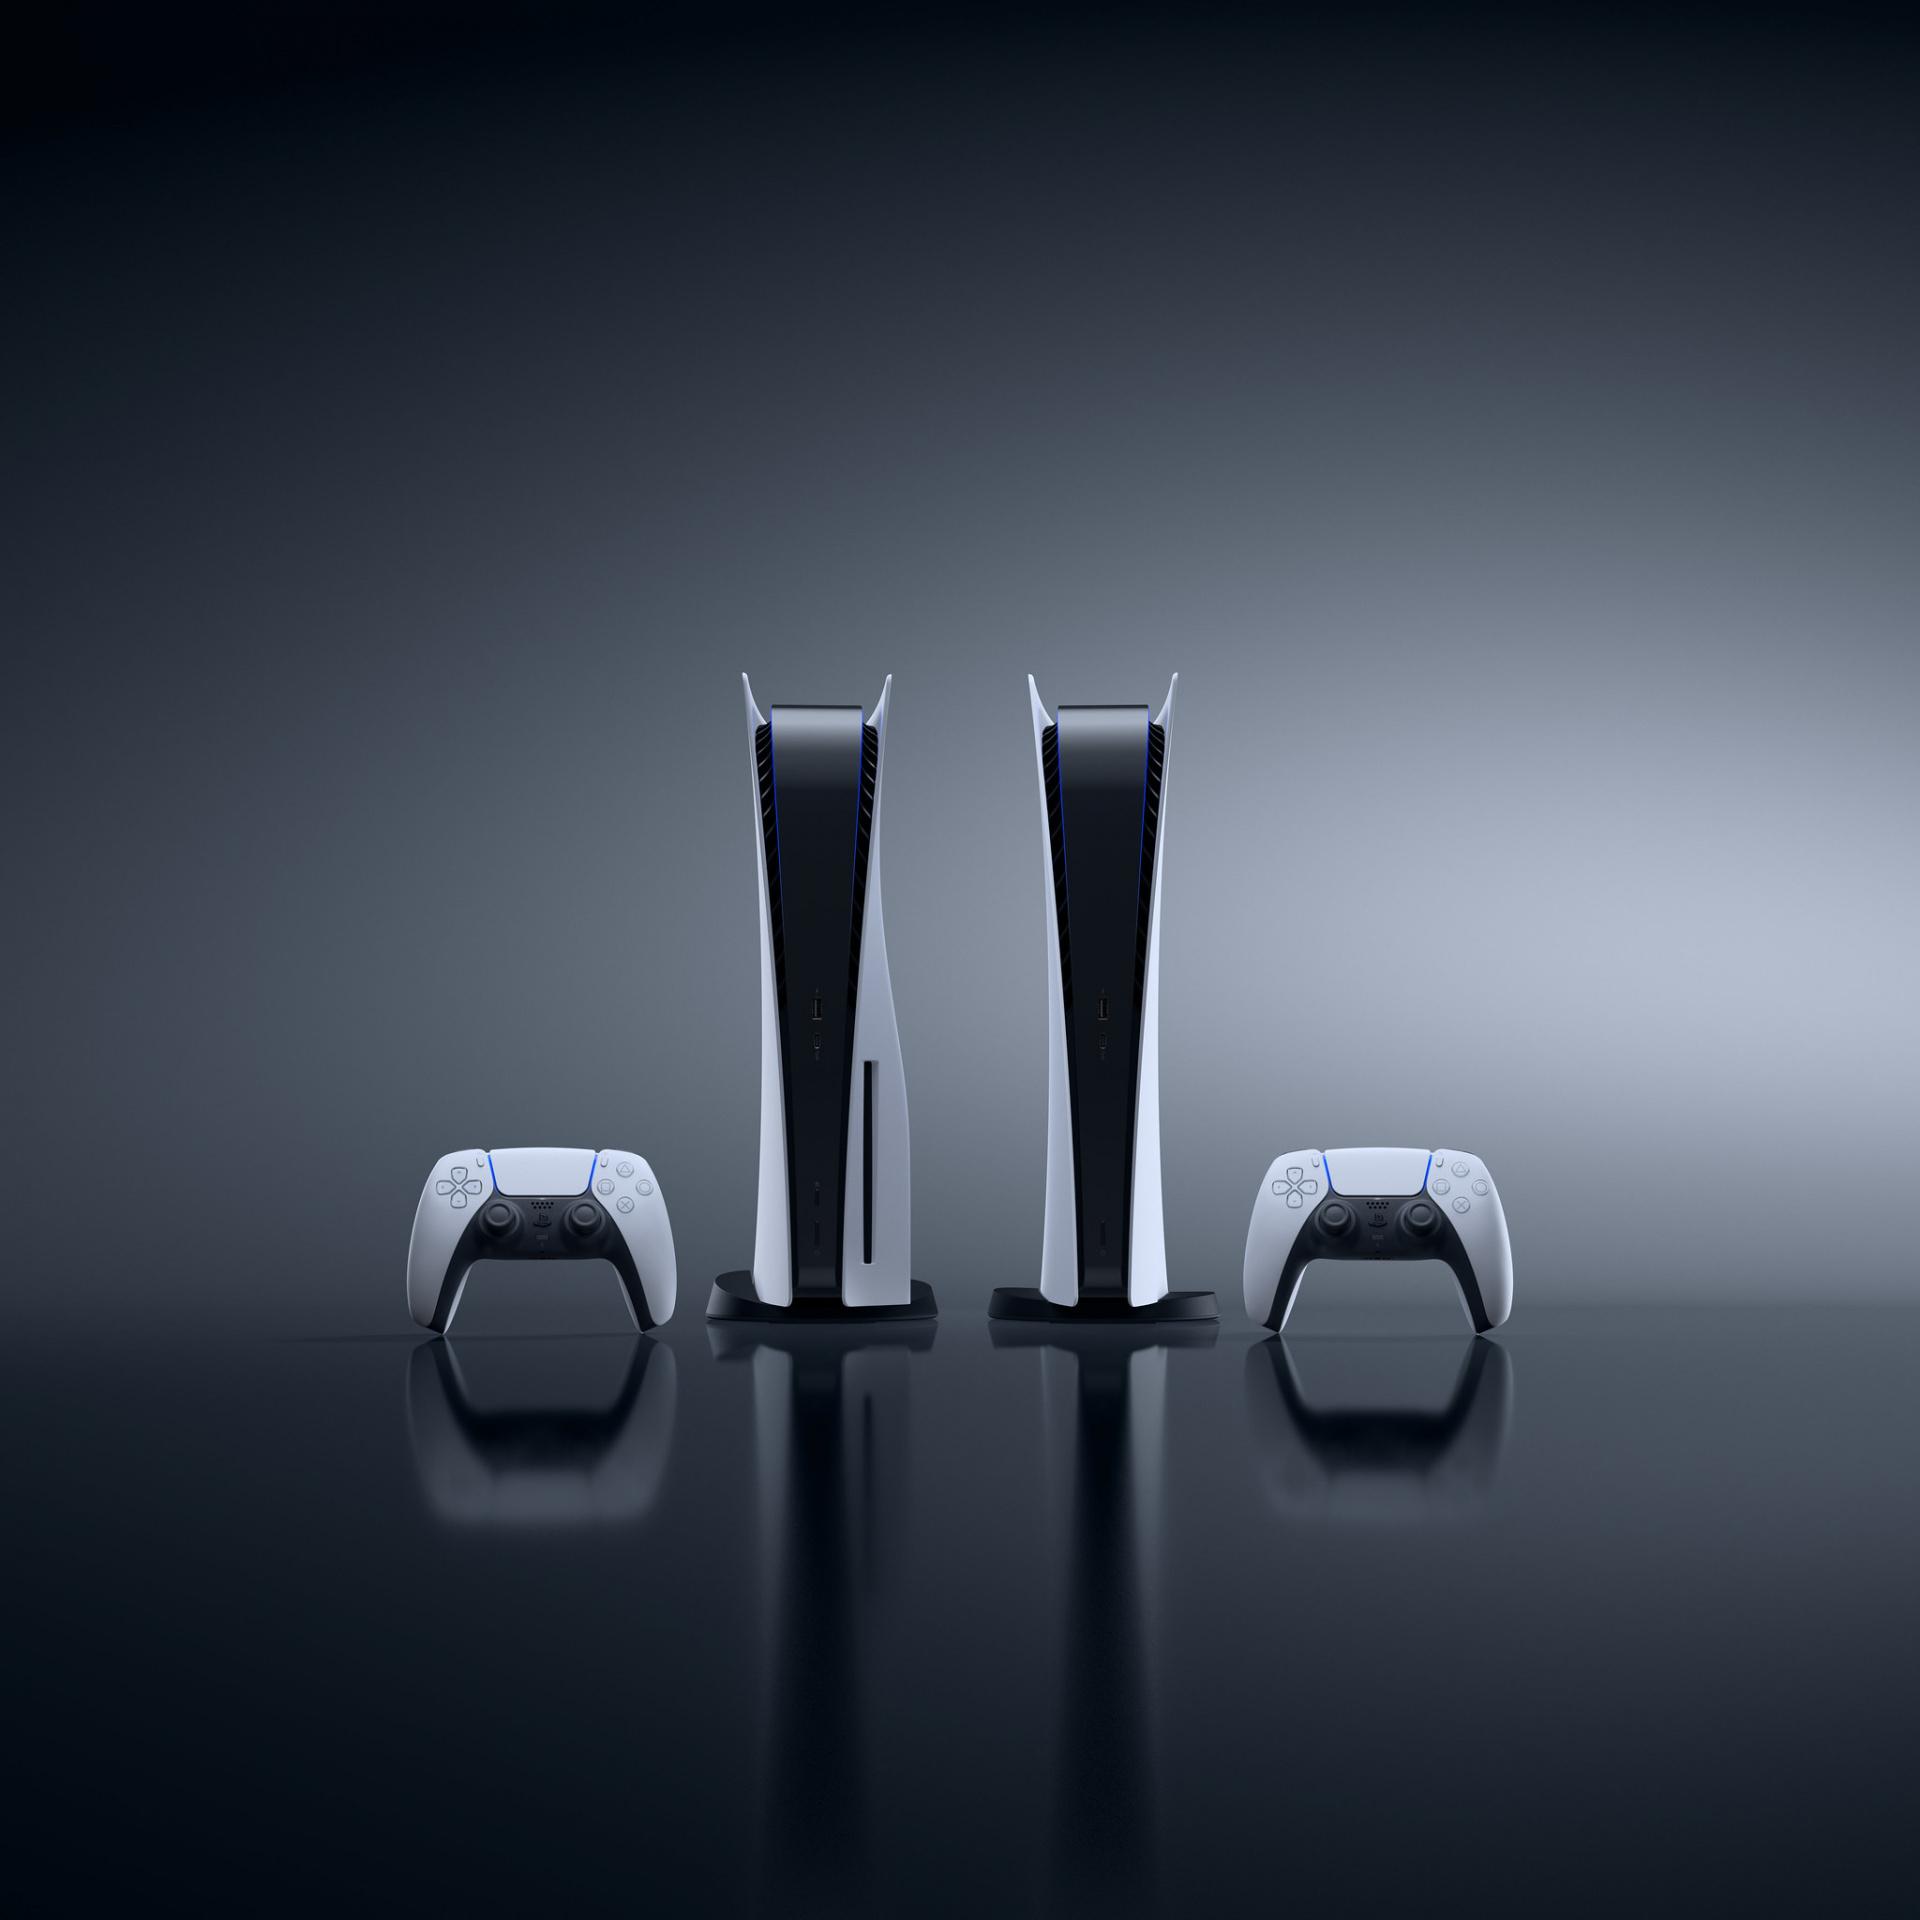 Sony выпустила28 HQ-фото PlayStation5 и её аксессуаров